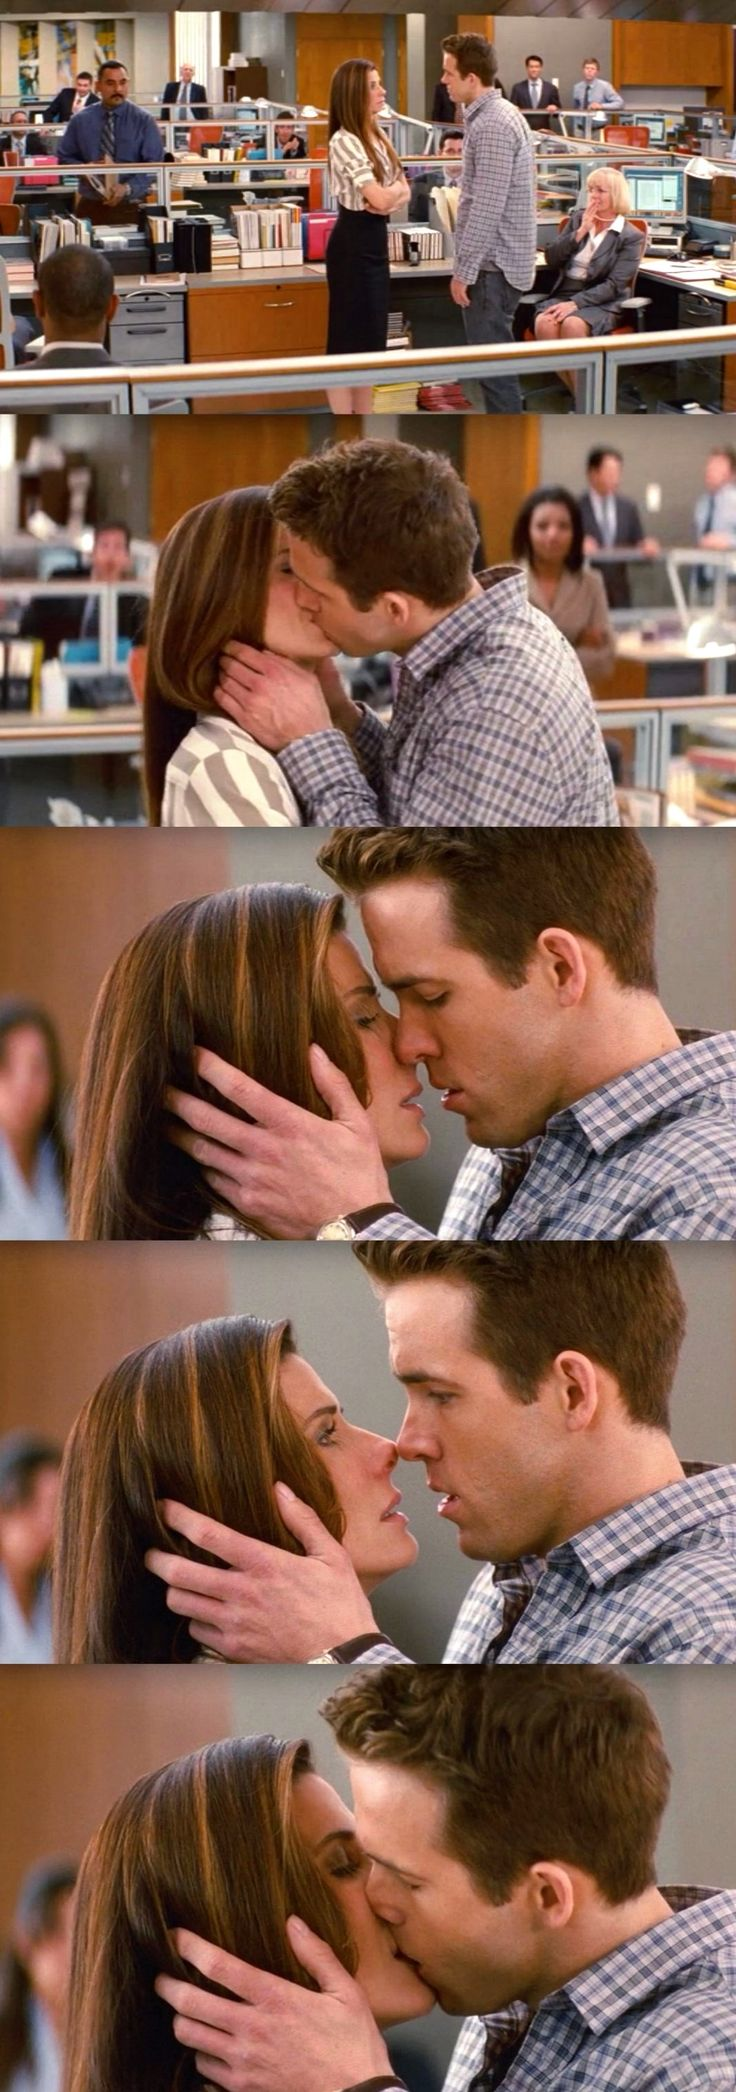 The Proposal - Sandra Bullock and Ryan Reynolds